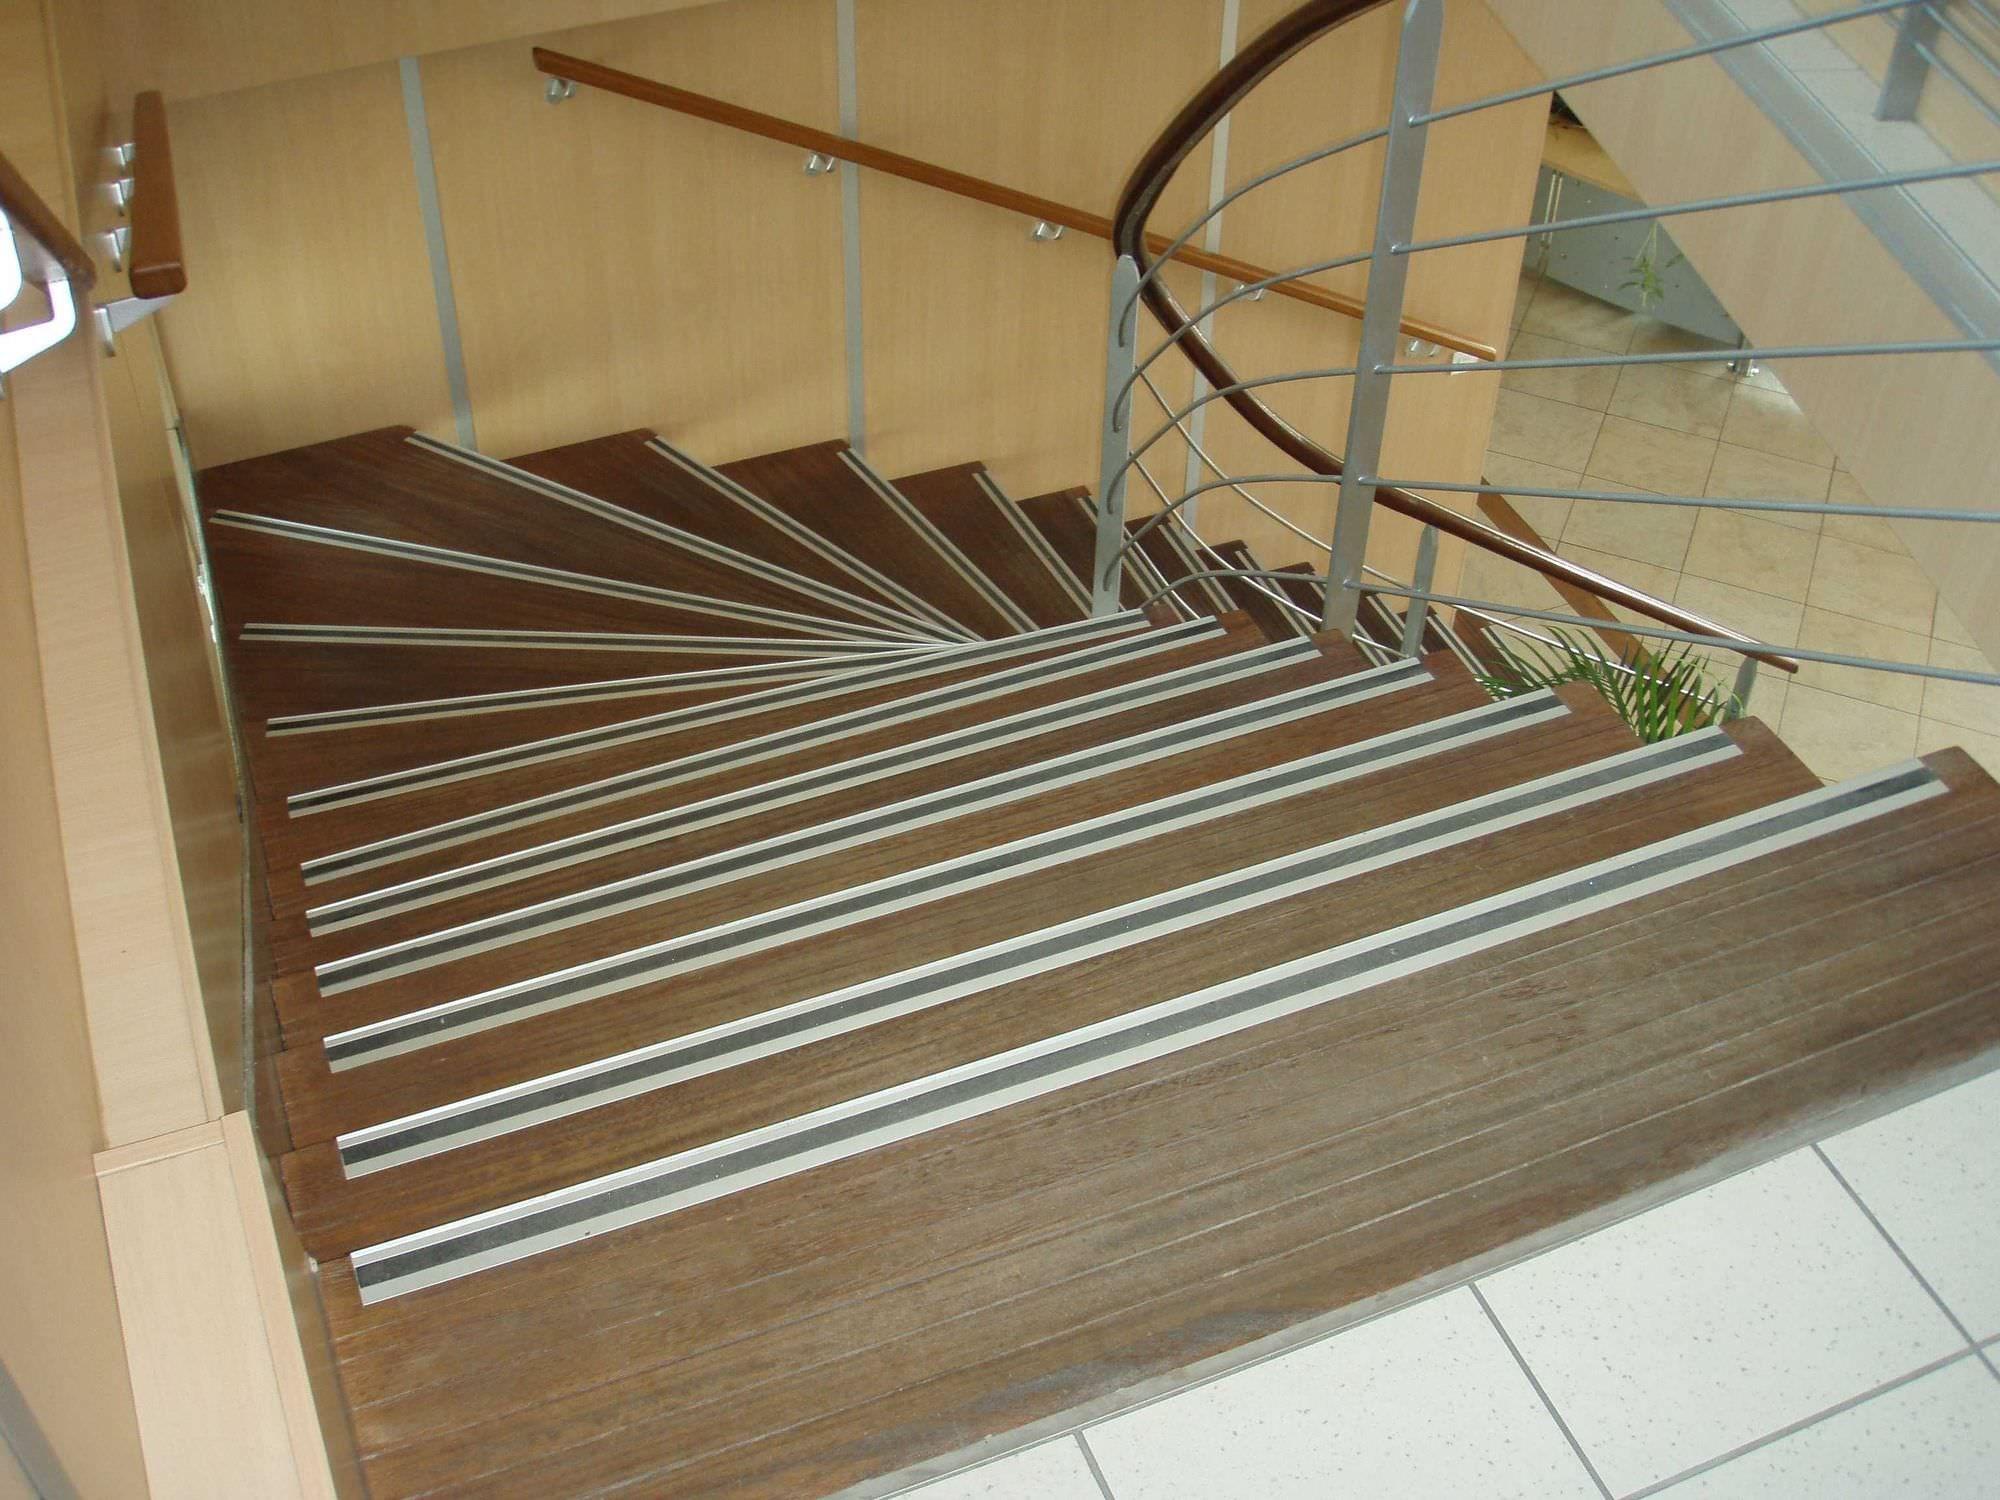 non slip stair nosing l29 tbs passage tbs house ideas. Black Bedroom Furniture Sets. Home Design Ideas